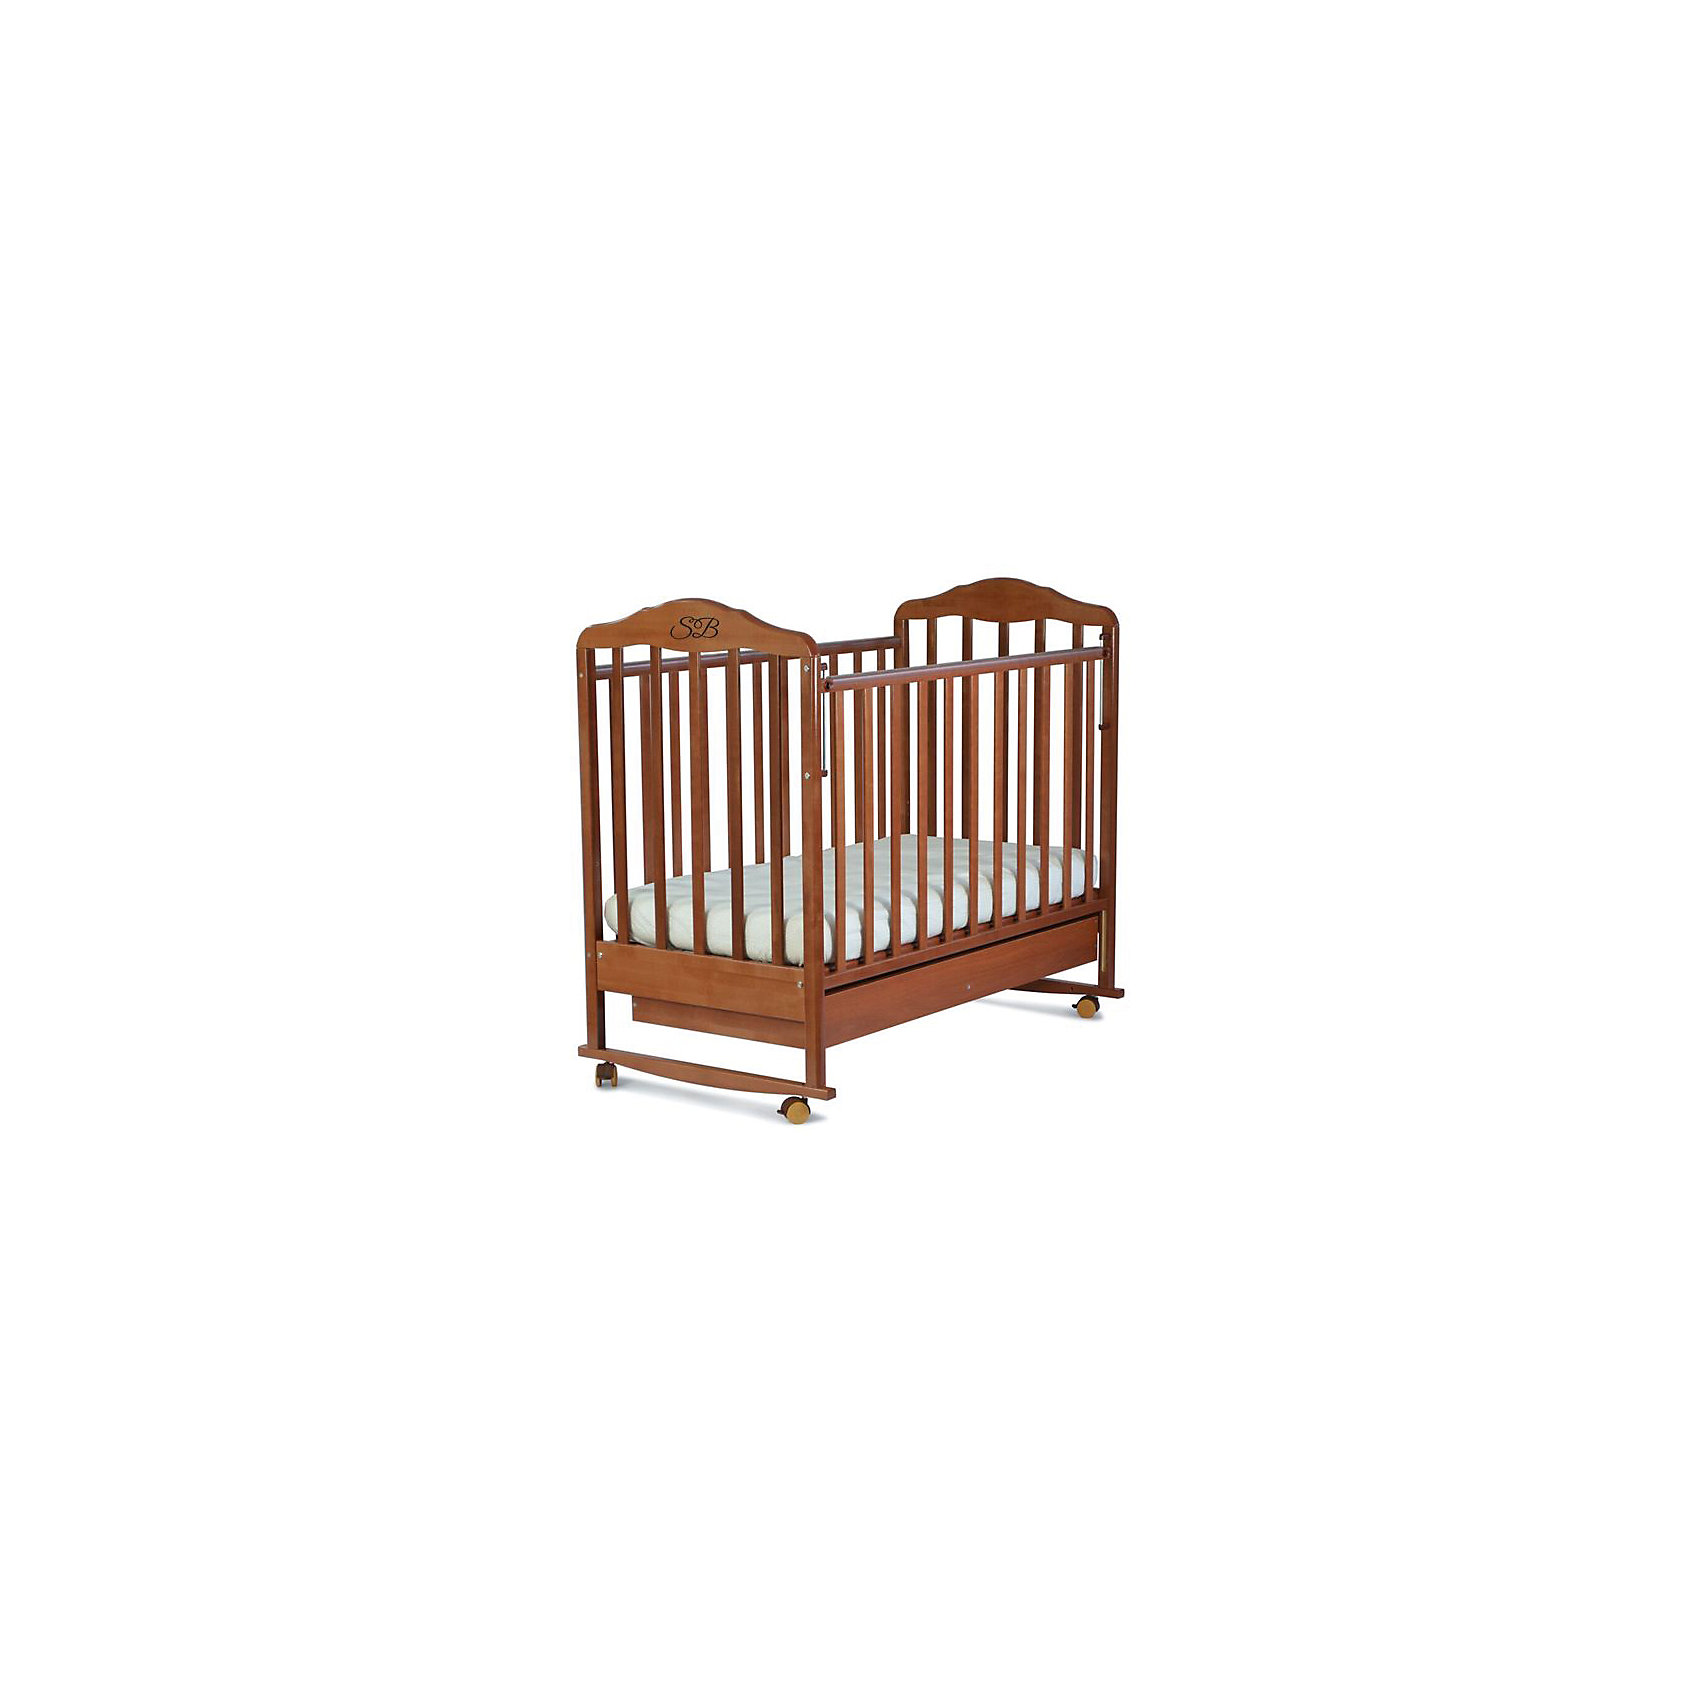 Кроватка Paolo Noce, Sweet Baby, орех<br><br>Ширина мм: 710<br>Глубина мм: 150<br>Высота мм: 1240<br>Вес г: 20000<br>Возраст от месяцев: 0<br>Возраст до месяцев: 36<br>Пол: Унисекс<br>Возраст: Детский<br>SKU: 5583574